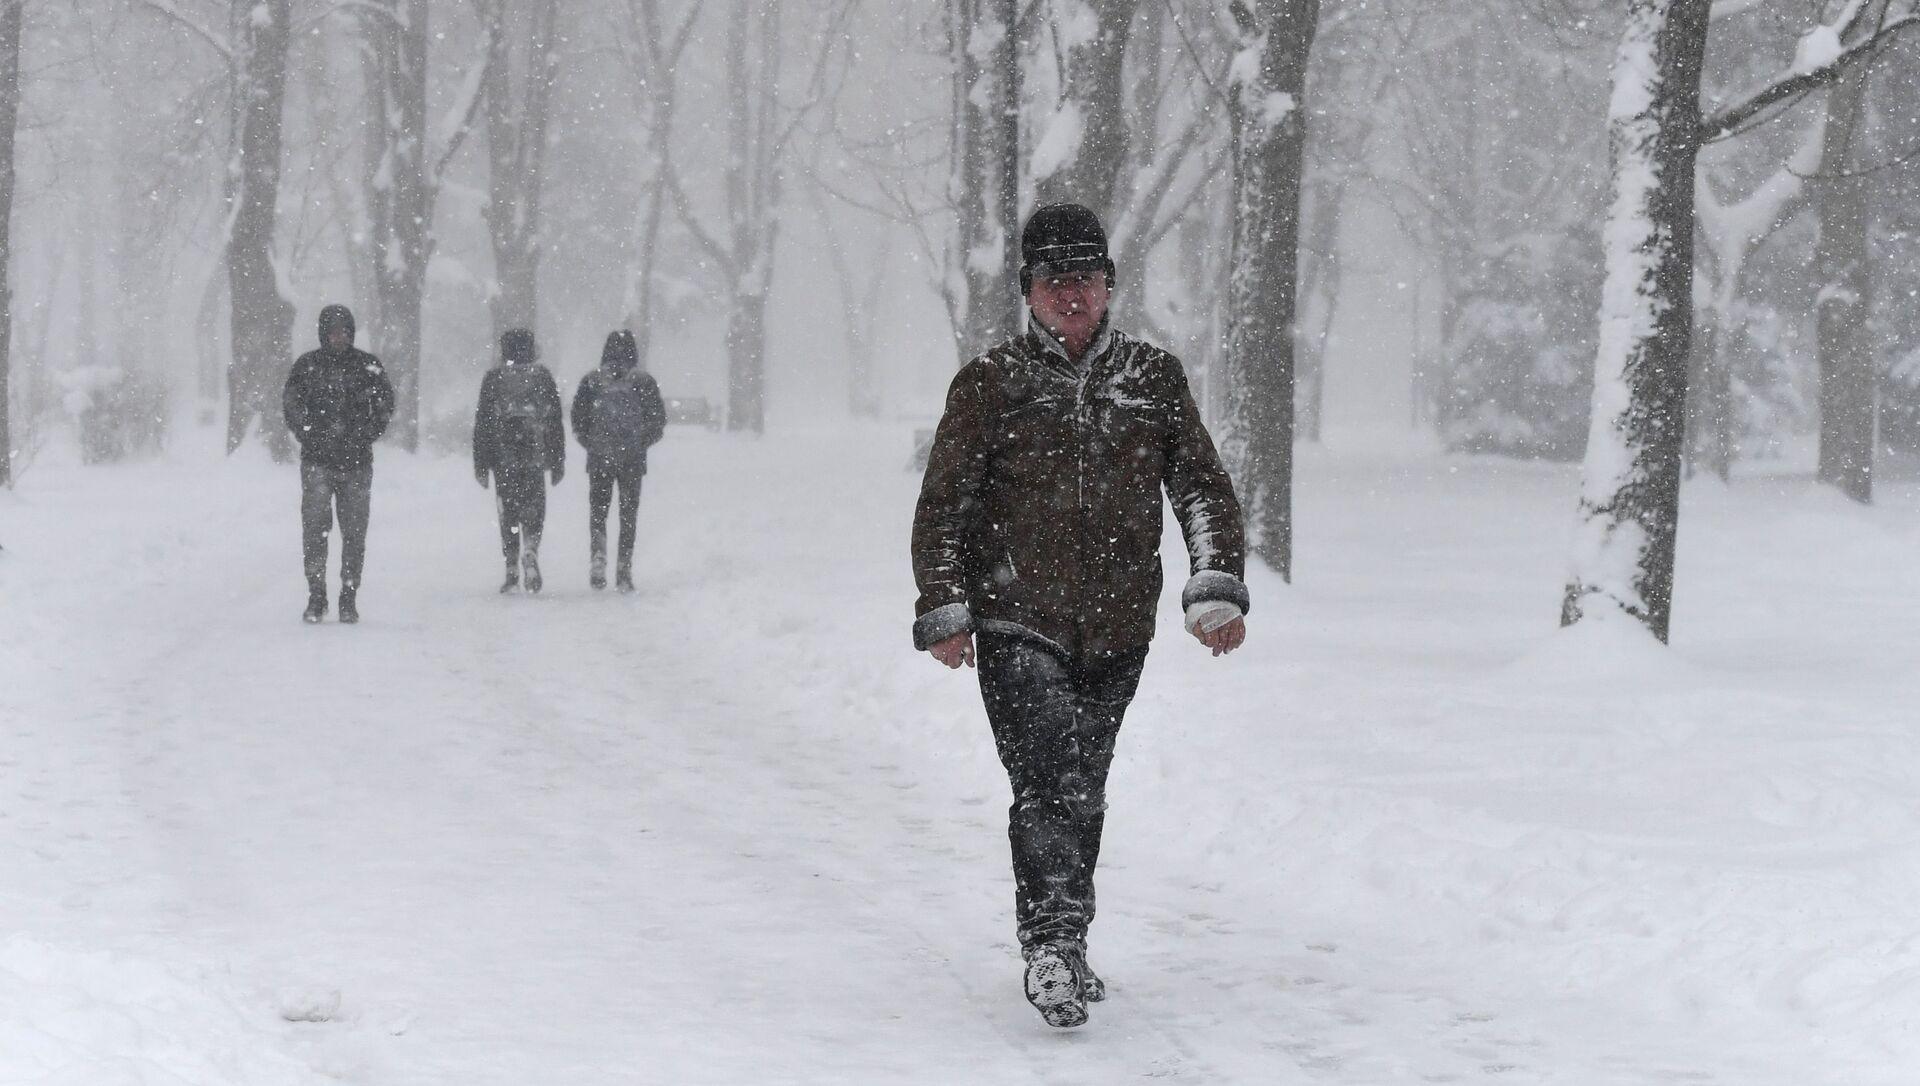 La neve in Crimea - Sputnik Italia, 1920, 21.02.2021